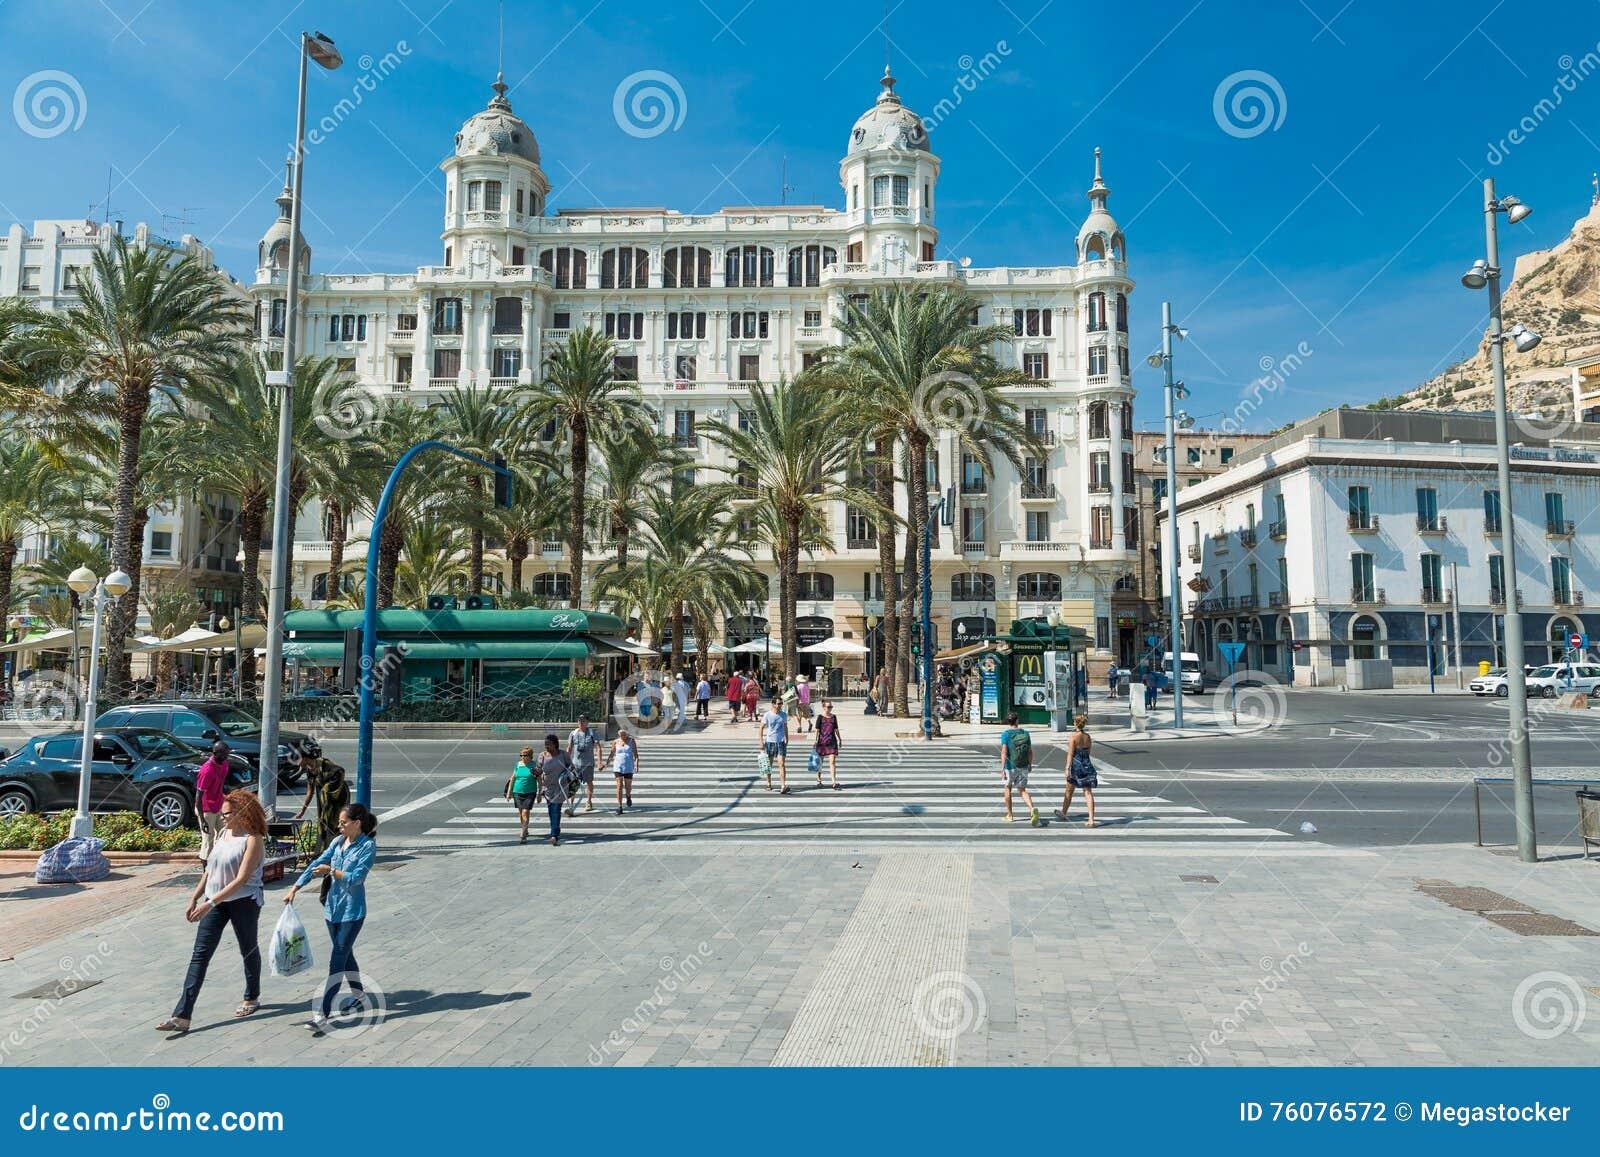 Alicante, Espagne - septembre 2015 : Place  plaza Puerta Del Mar